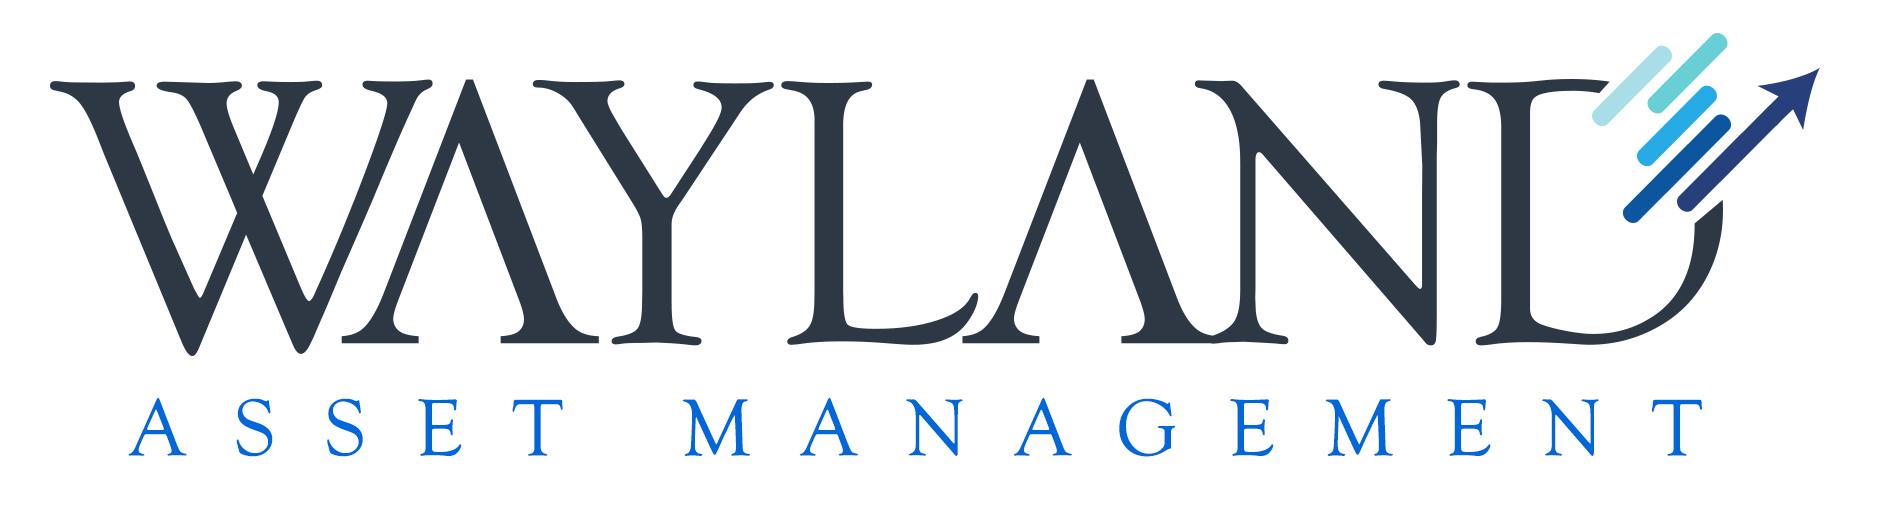 Wayland Asset Management hires Daniel Hunter as Senior Portfolio Manager